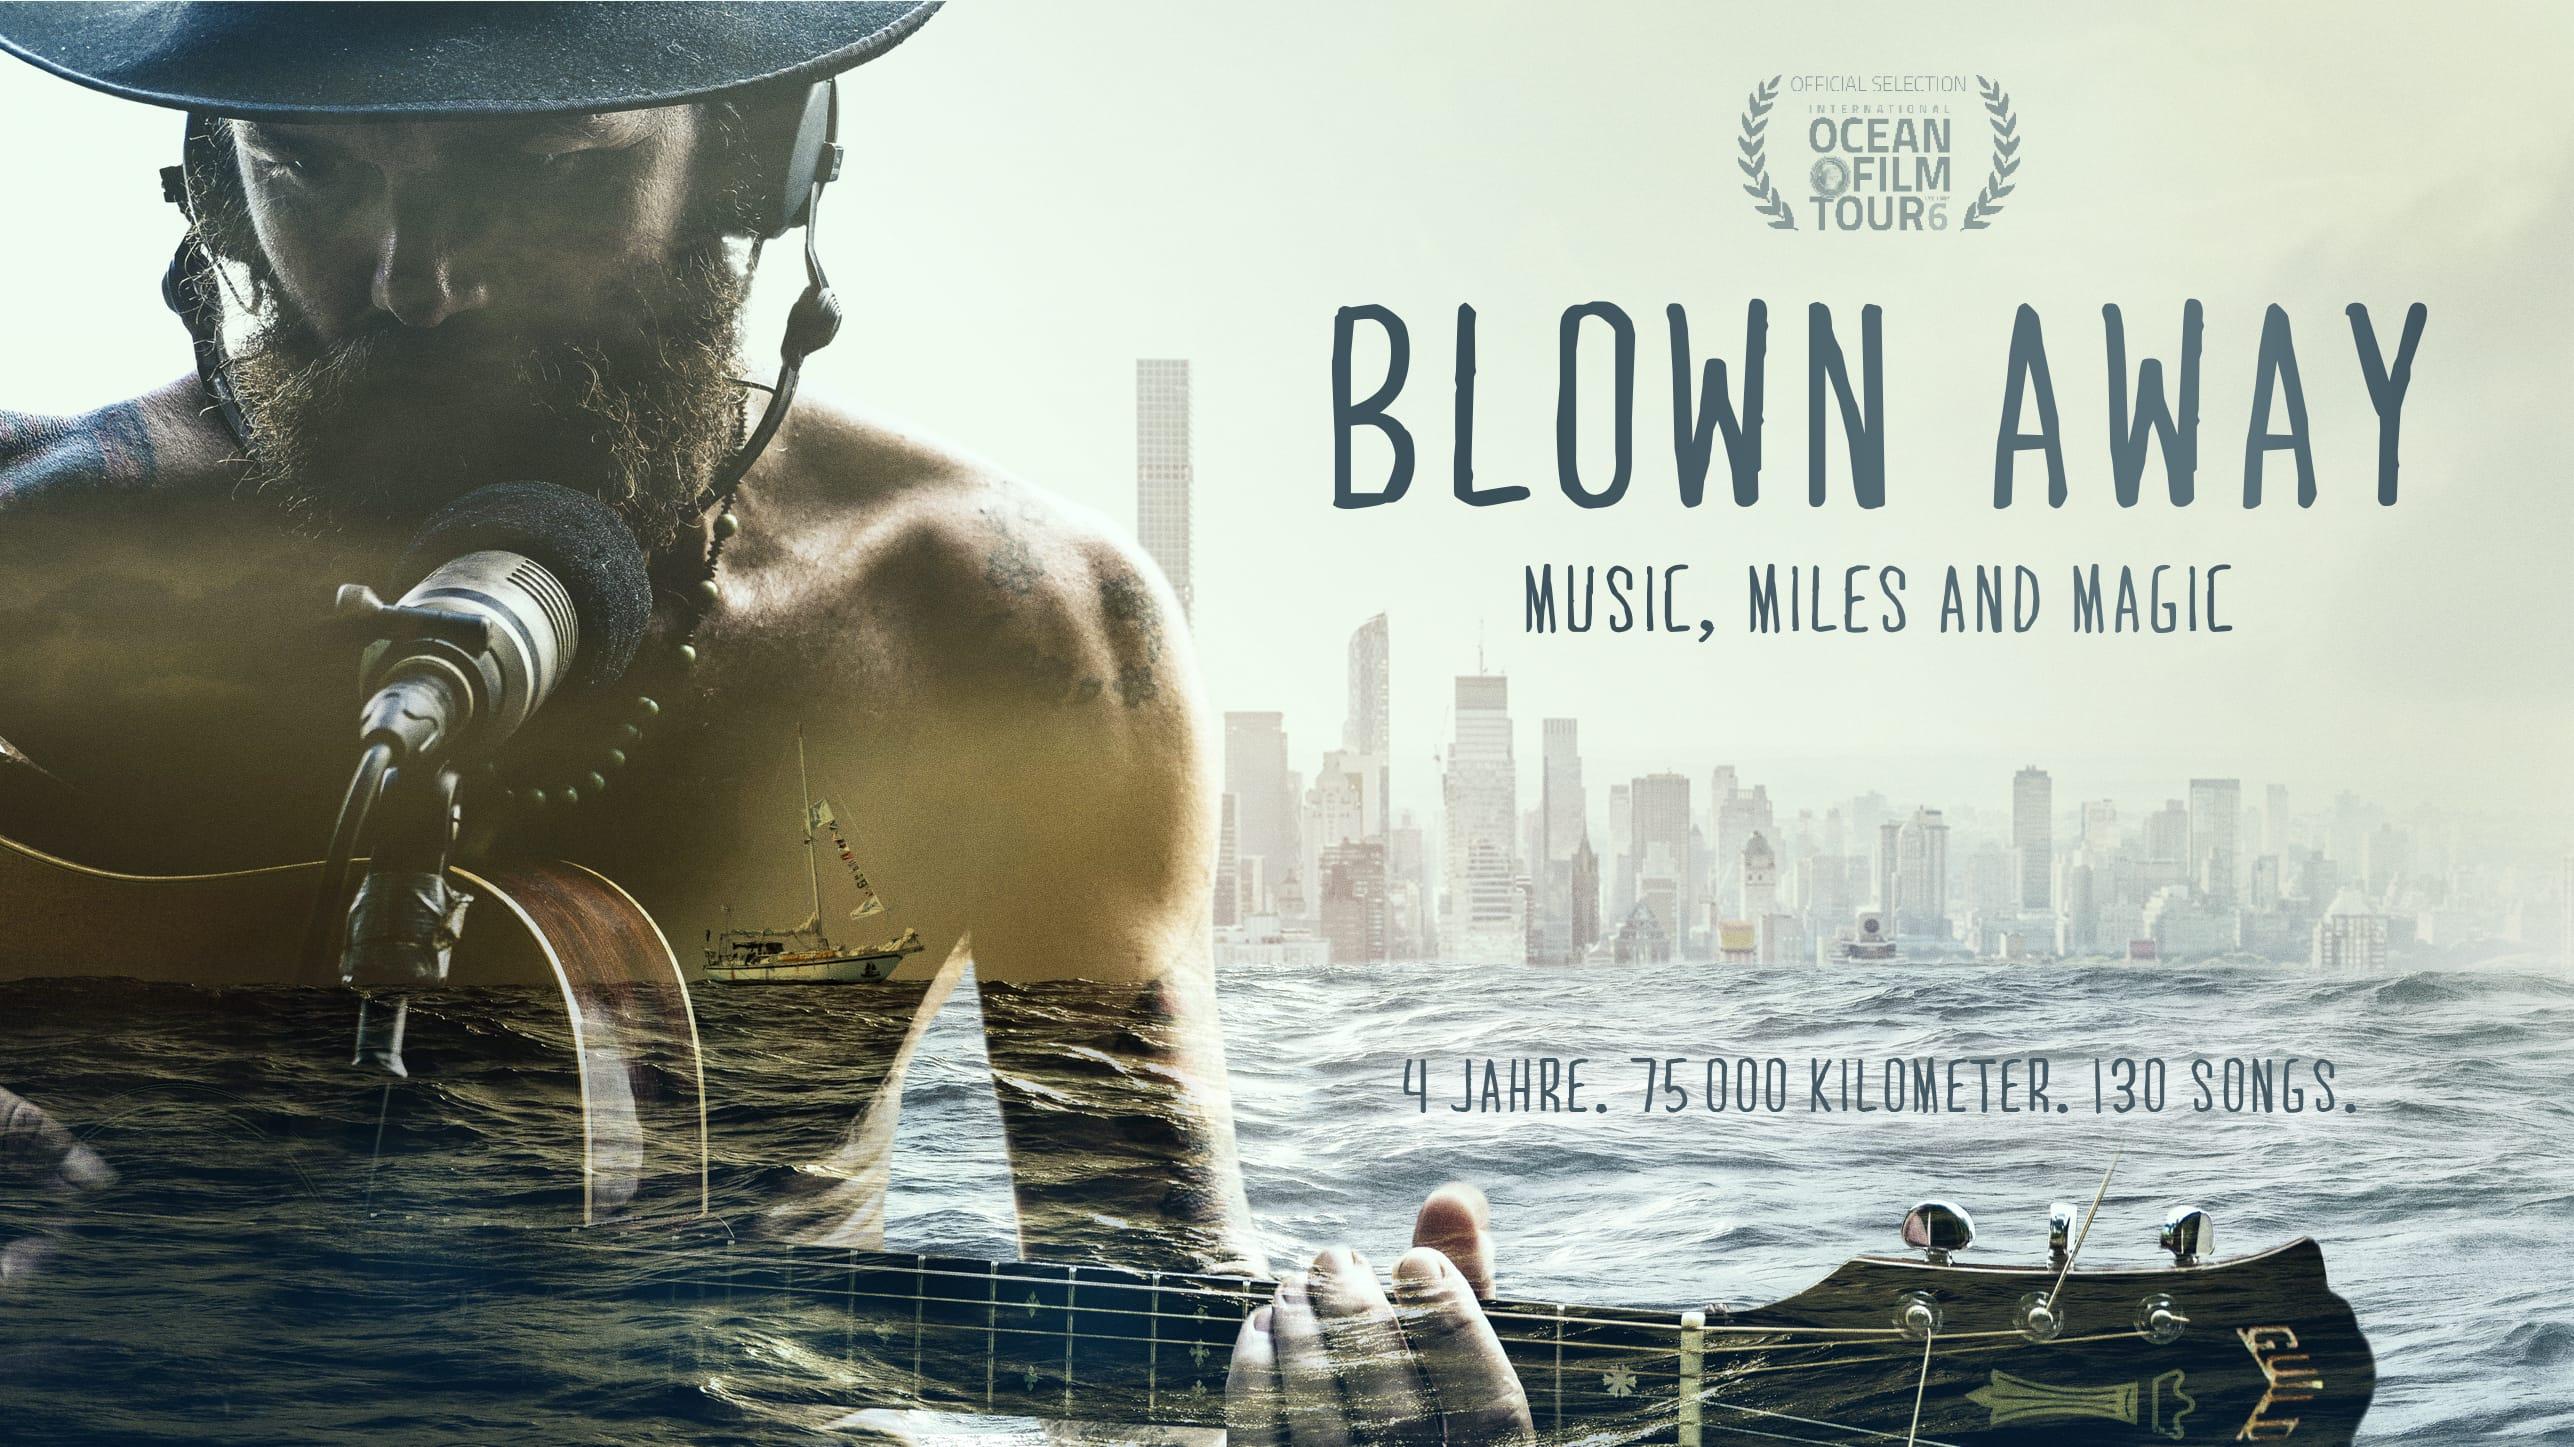 Monday 30.09.19 – 8:30pm: Blown Away   Screening + Live Music Performance